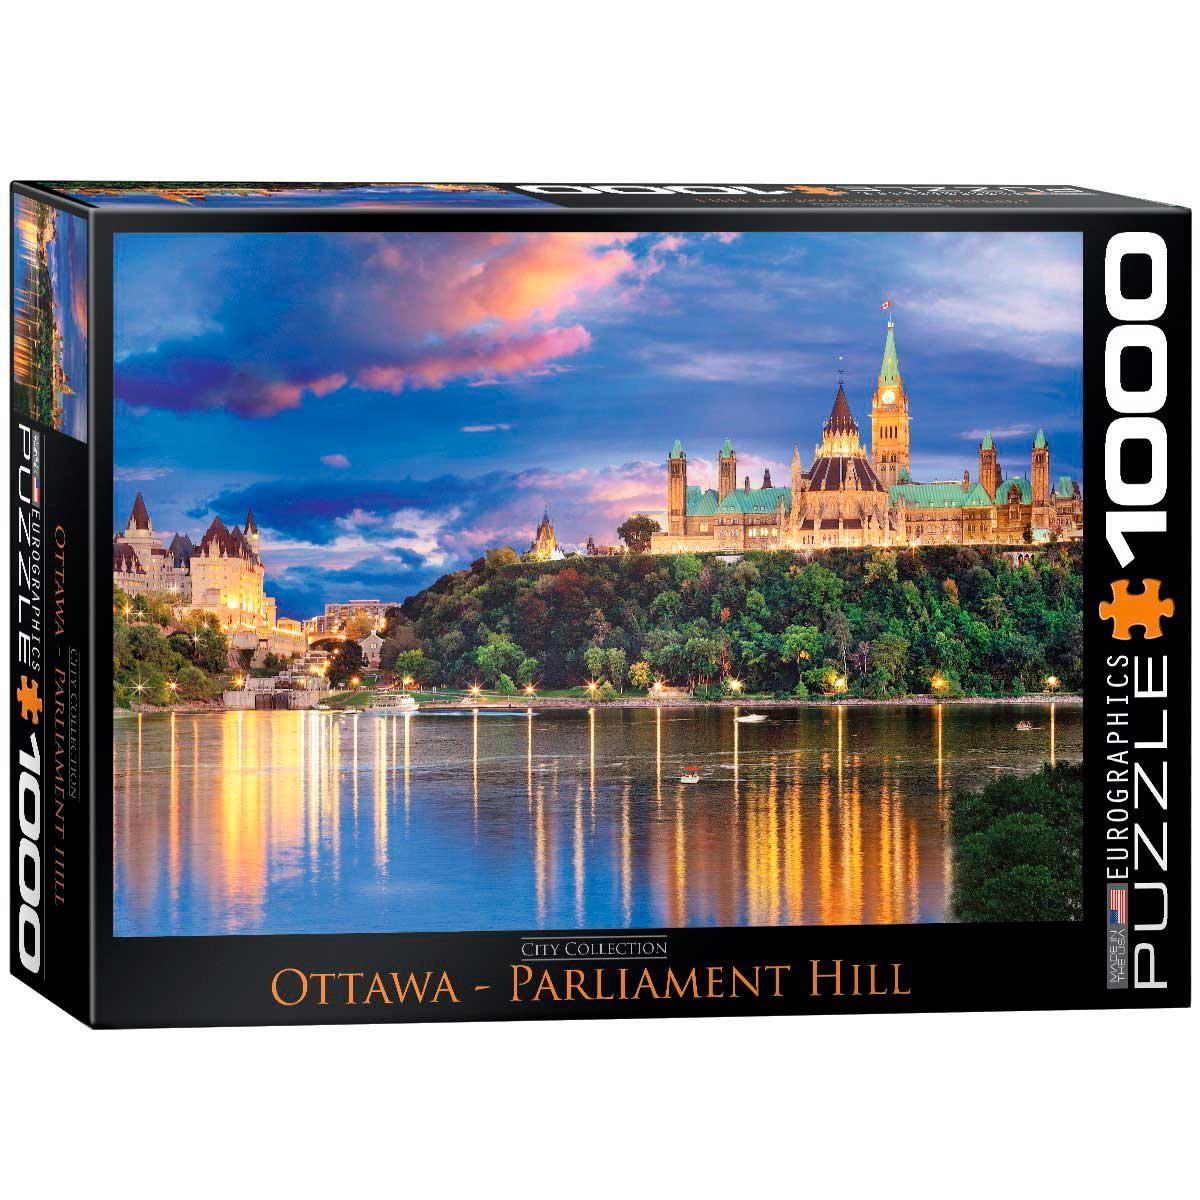 Puzzle Eurographics Parliament Hill, Ottawa de 1000 Piezas